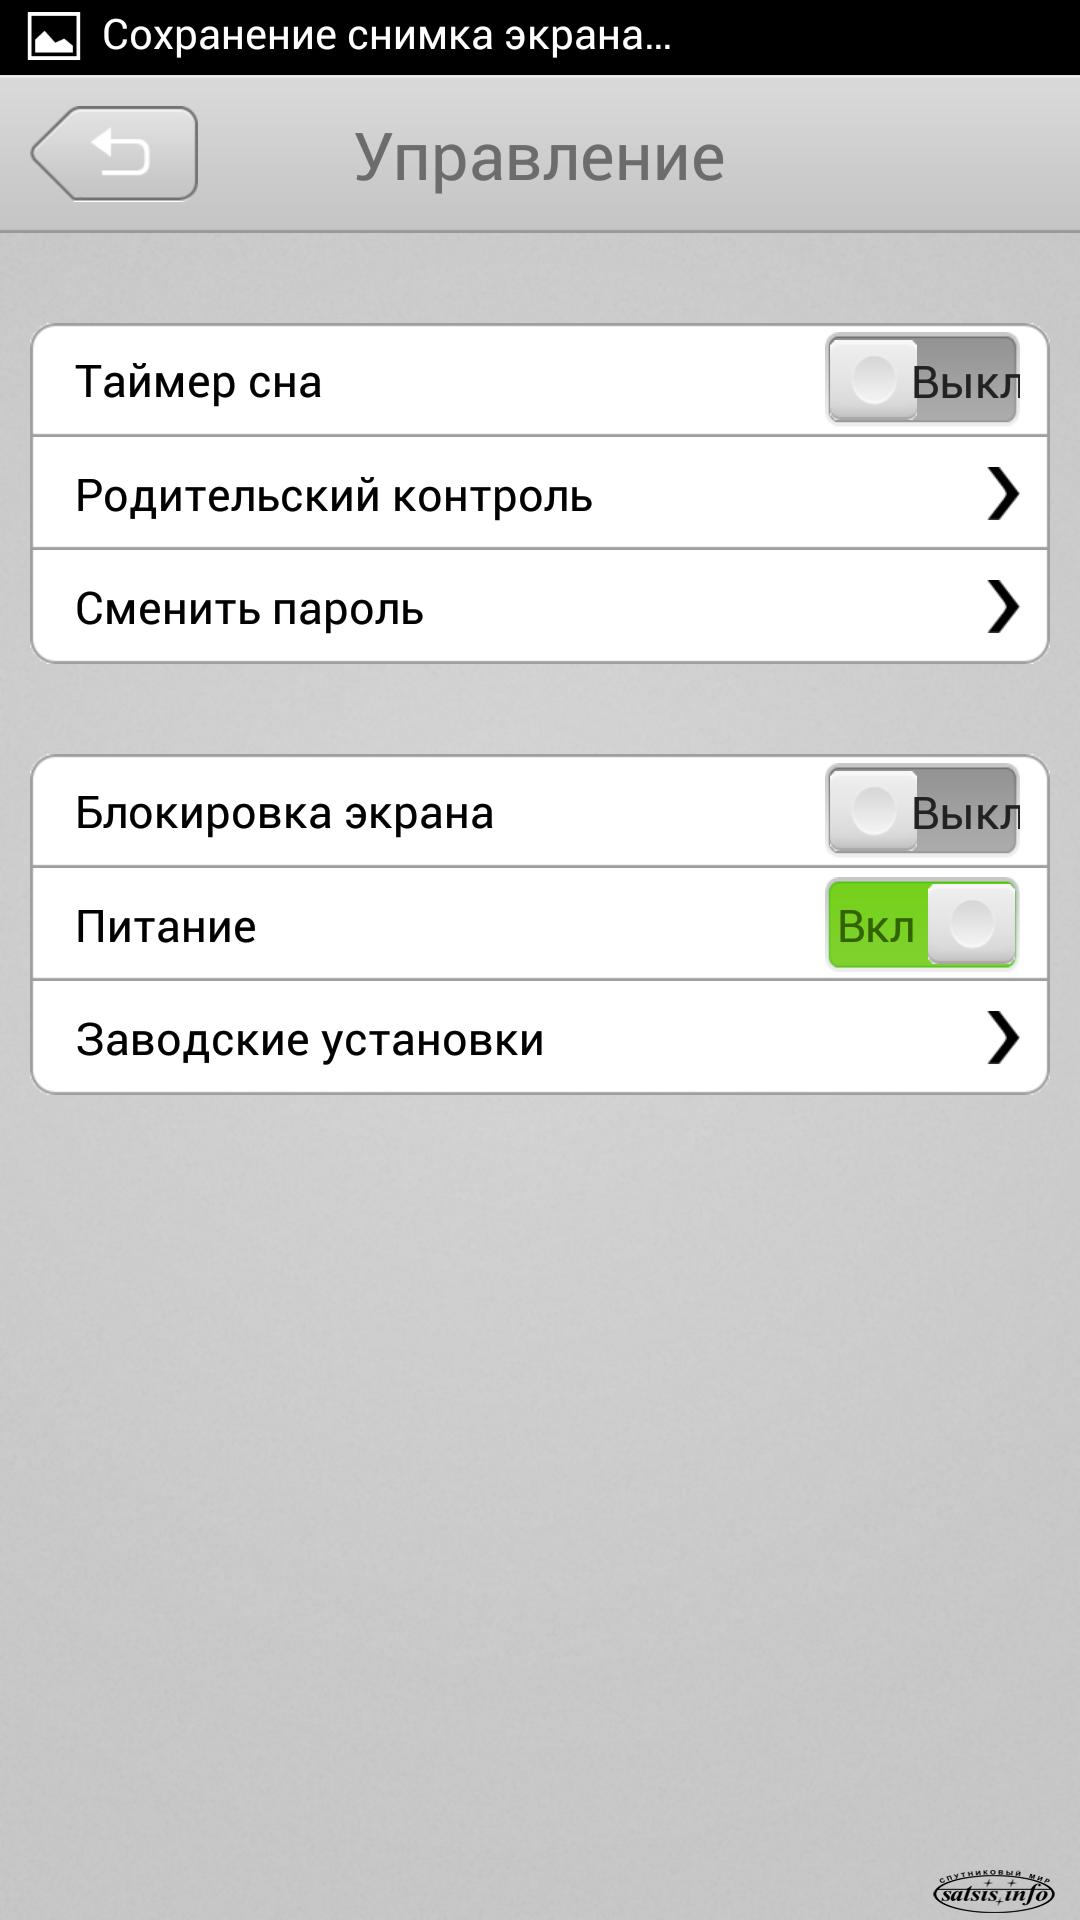 https://satsis.info/uploads/forum/posts/2014-06/1401808322_www.satsis.info_g_mscreen_9.png